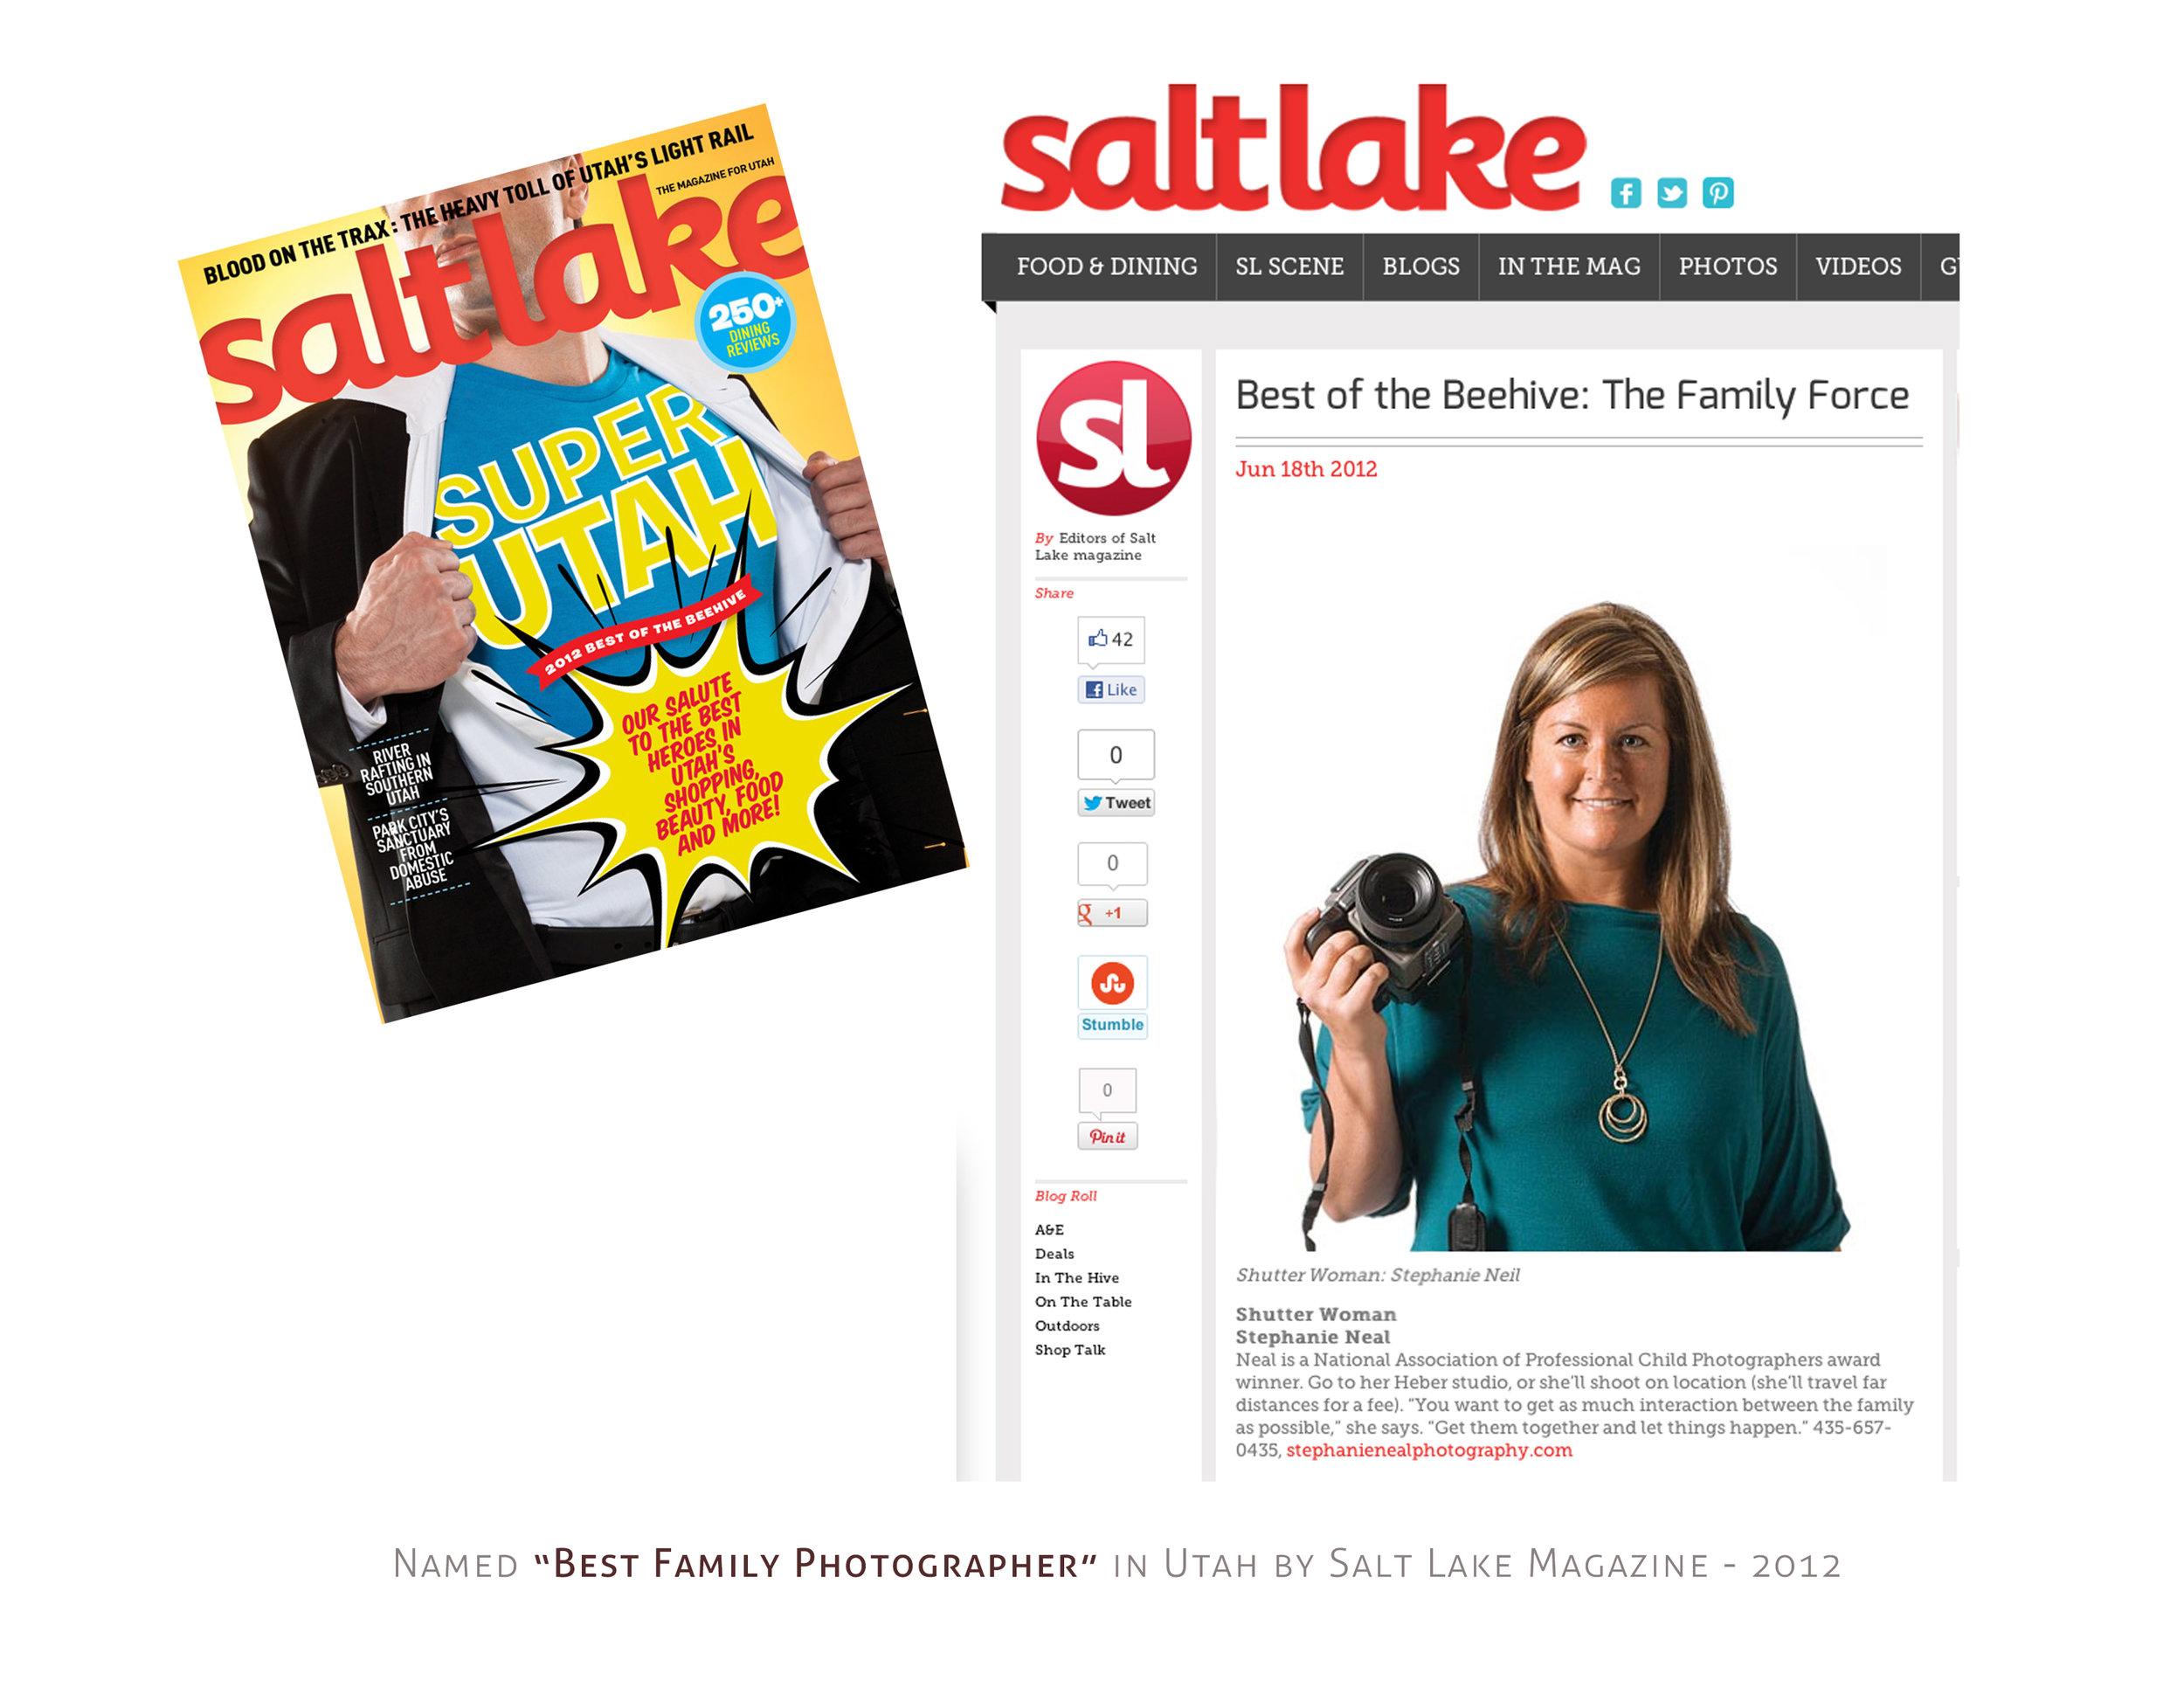 Salt Lake Best of the Beehive award